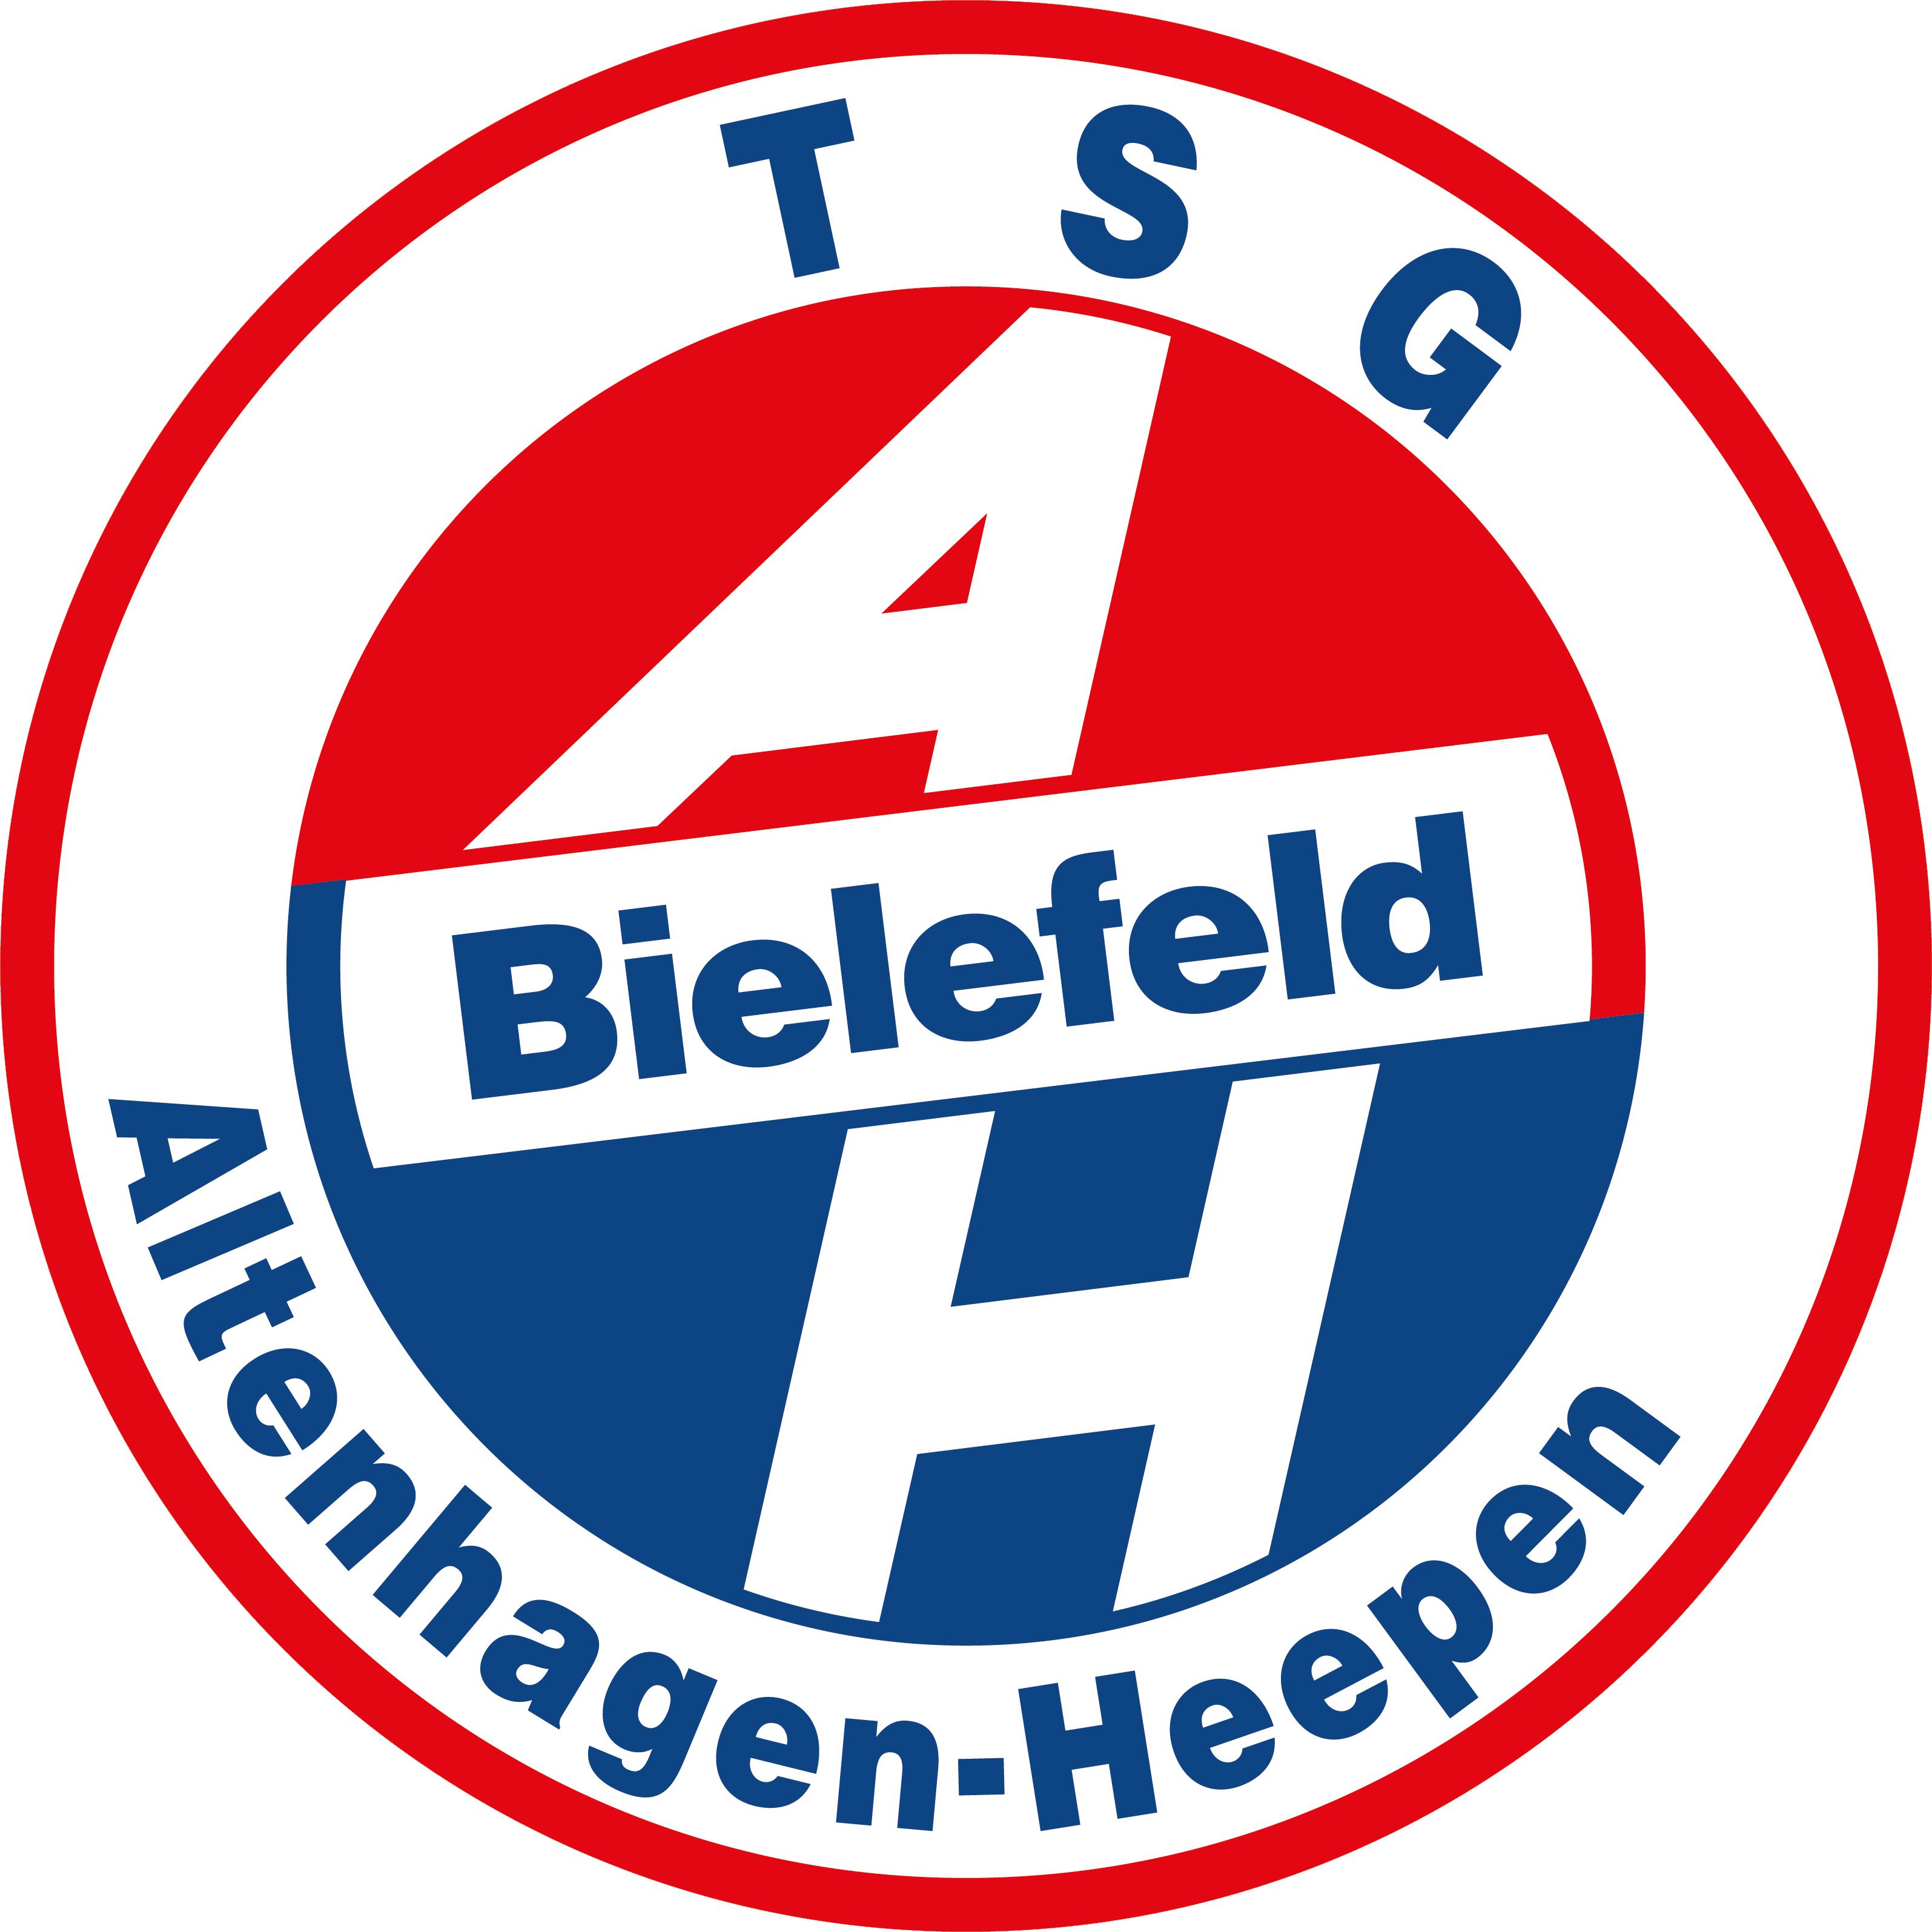 TSG A-H Bielefeld